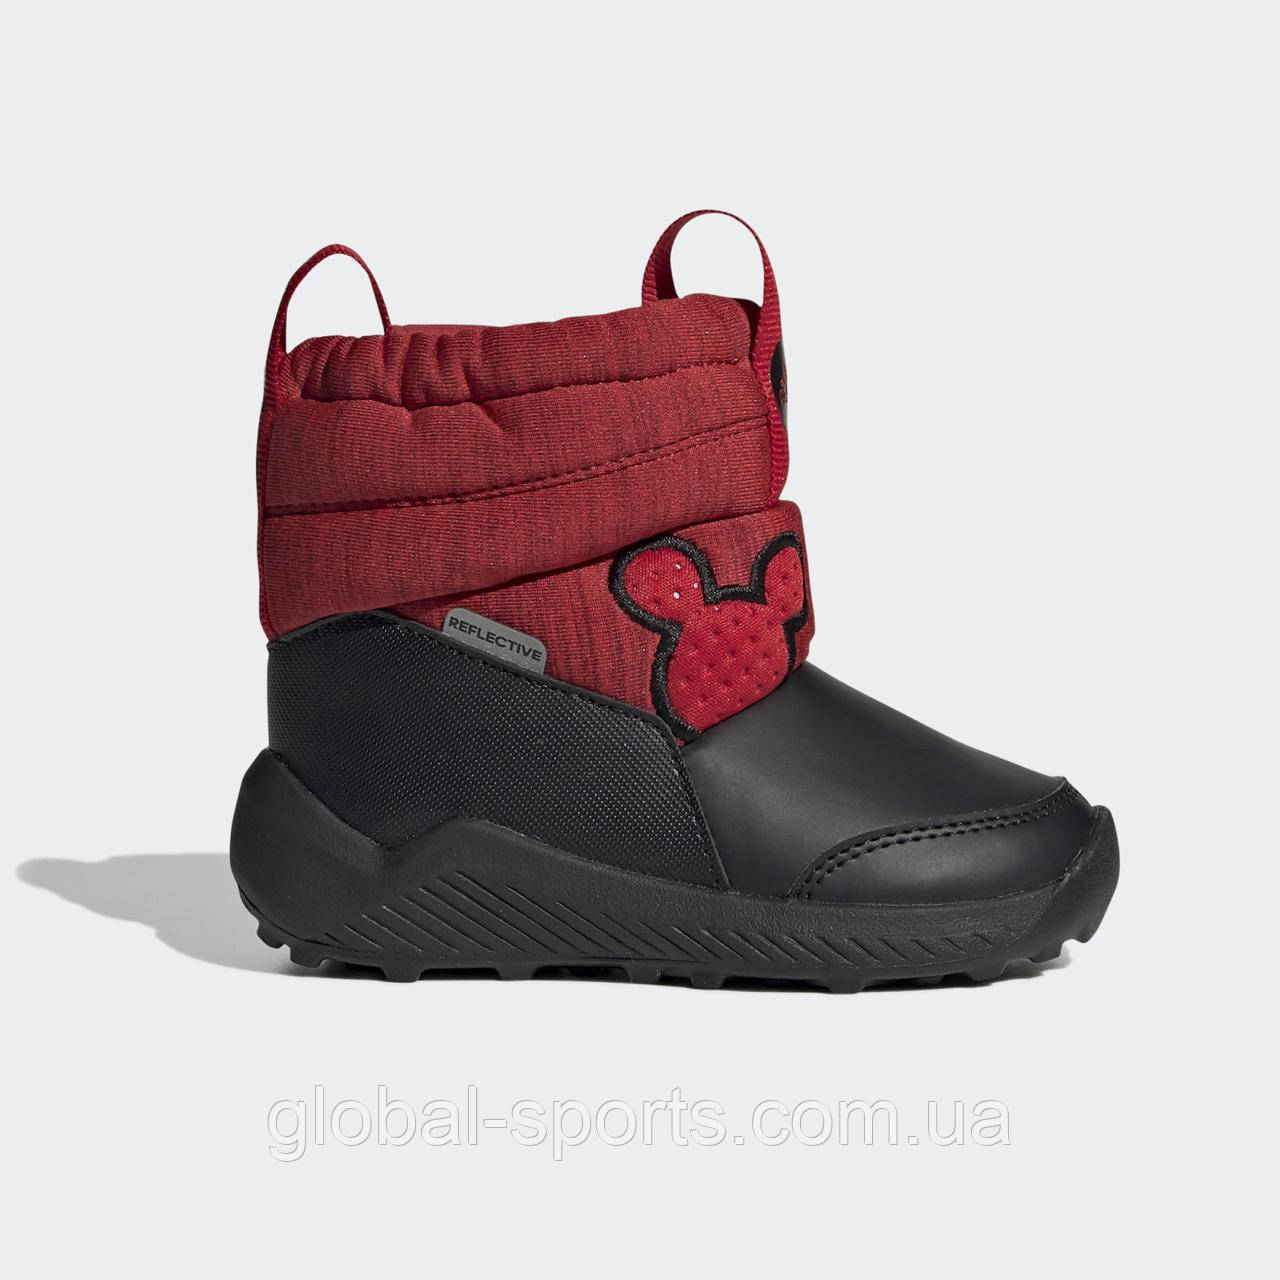 Дитячі чоботи Adidas RapidaSnow Minnie I (Артикул:G27540)